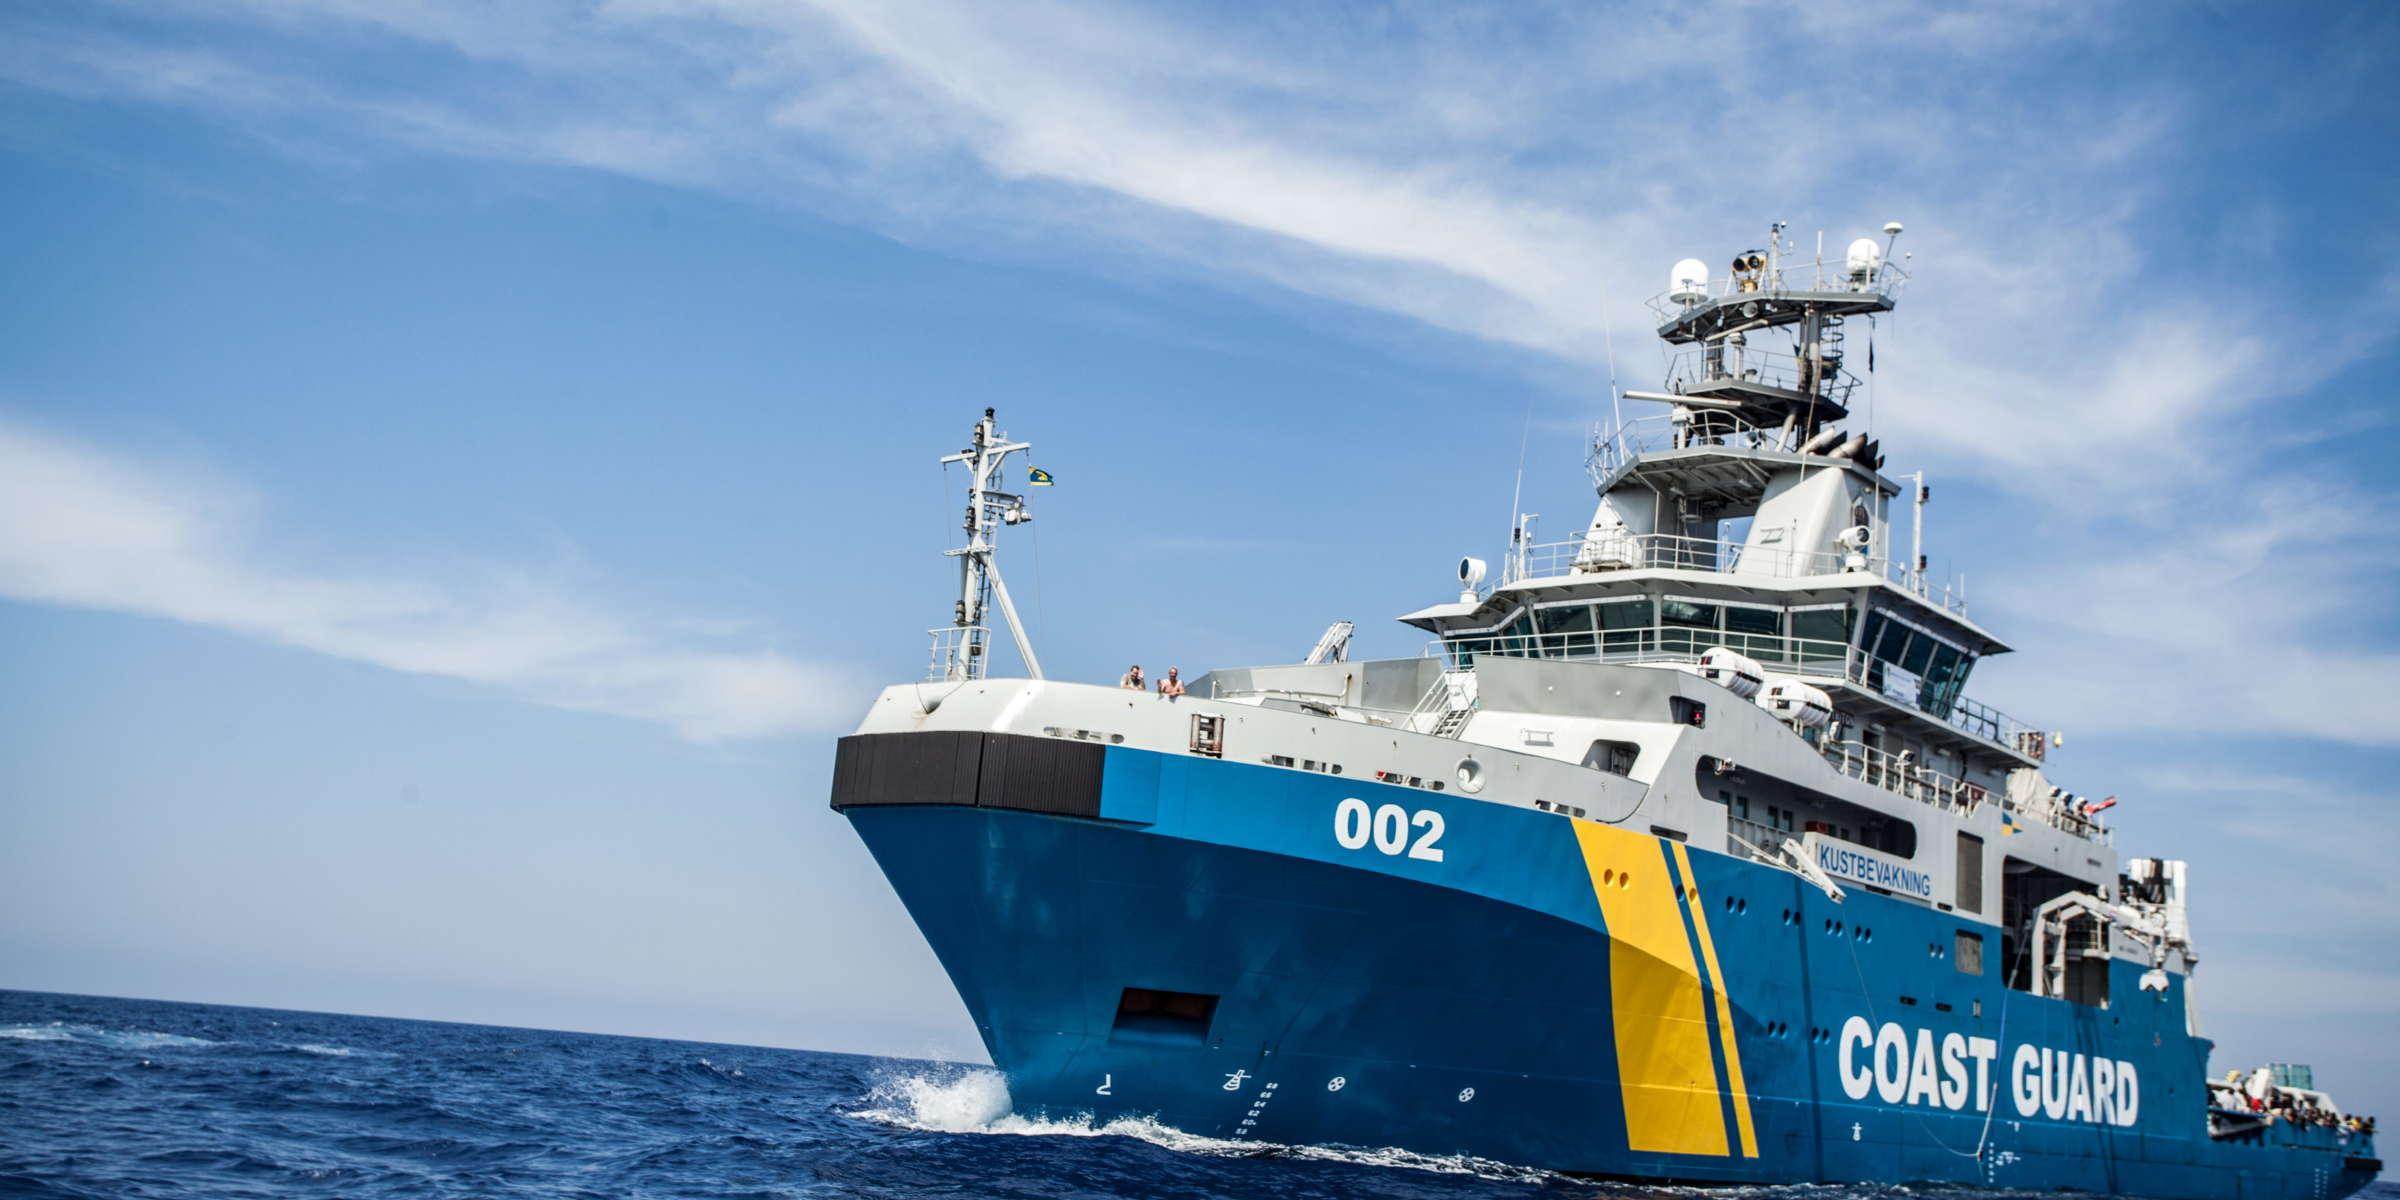 Kombinationsfartyg KBV 002 Triton